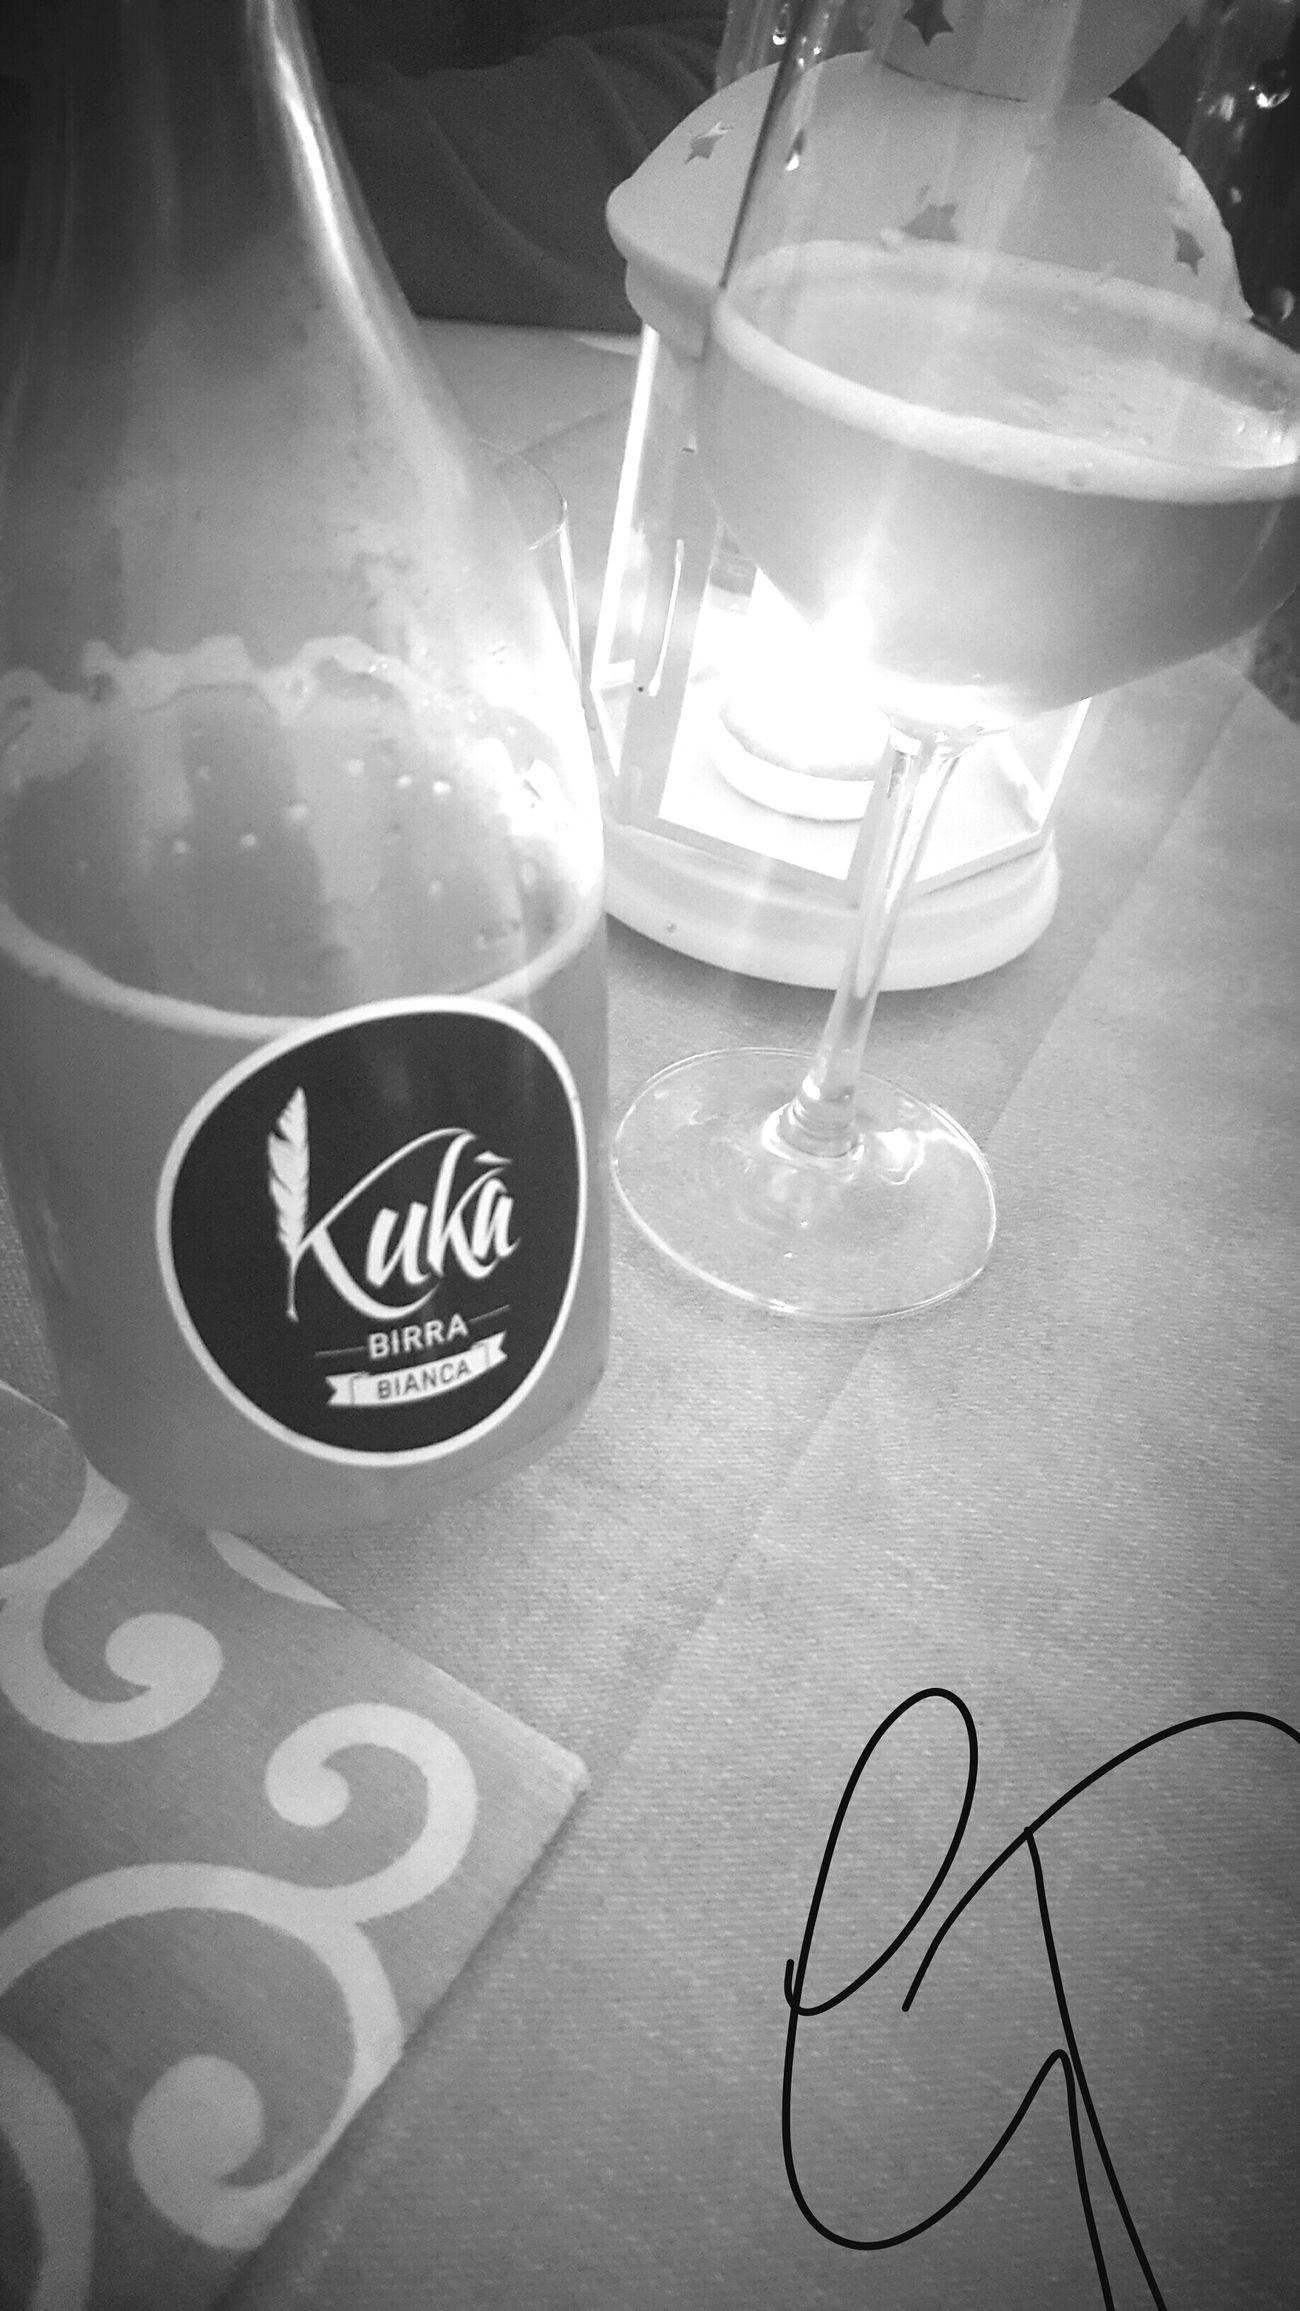 Beer Kuka Drink Restaurants Passion City Life